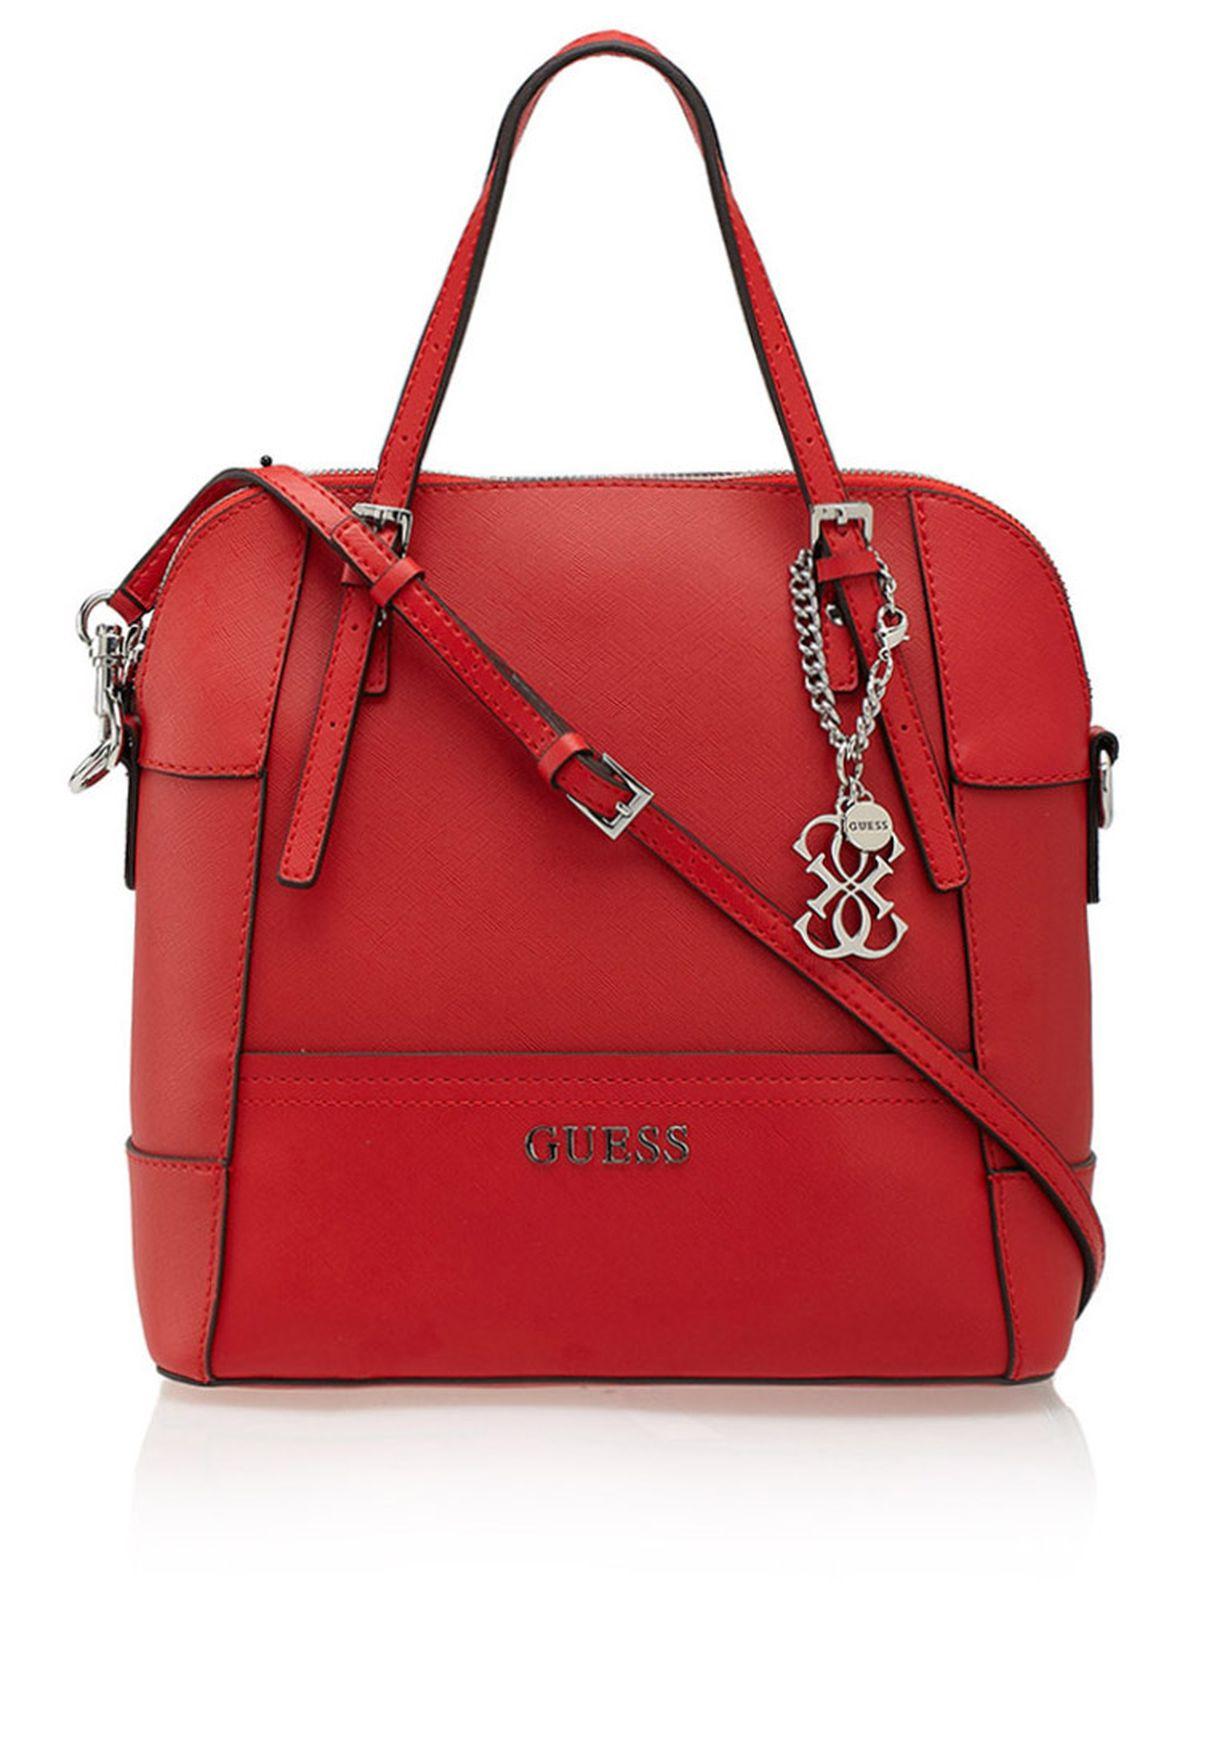 b3f76ccffb7b Shop Guess red Delaney Tote for Women in Saudi - GU094AC85SMG